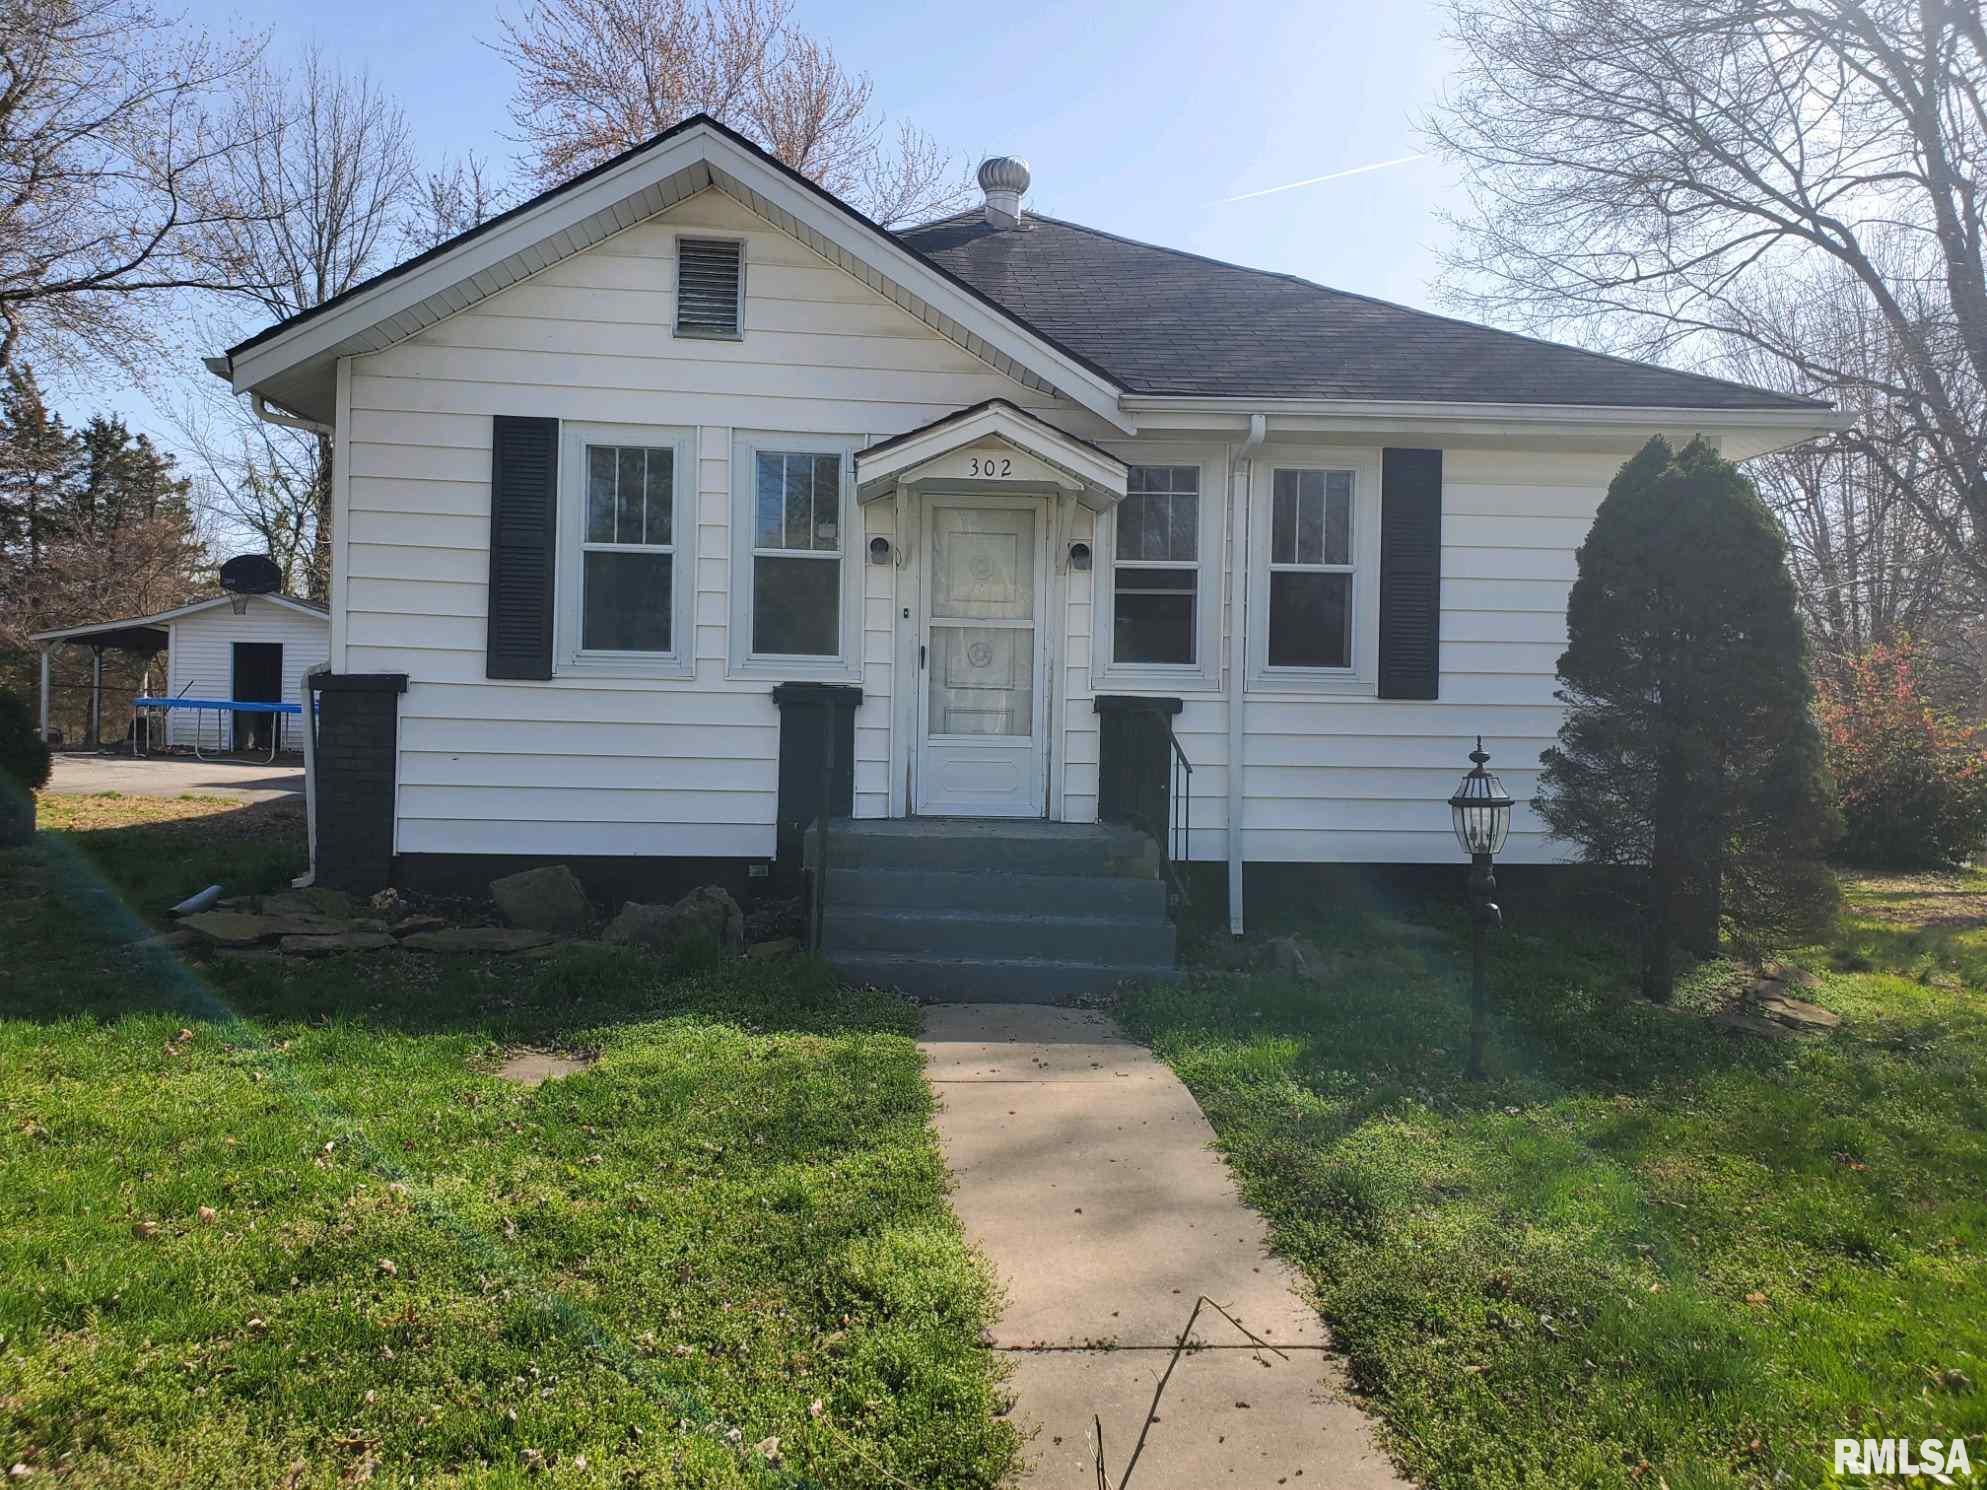 302 W WALNUT Property Photo - Jonesboro, IL real estate listing